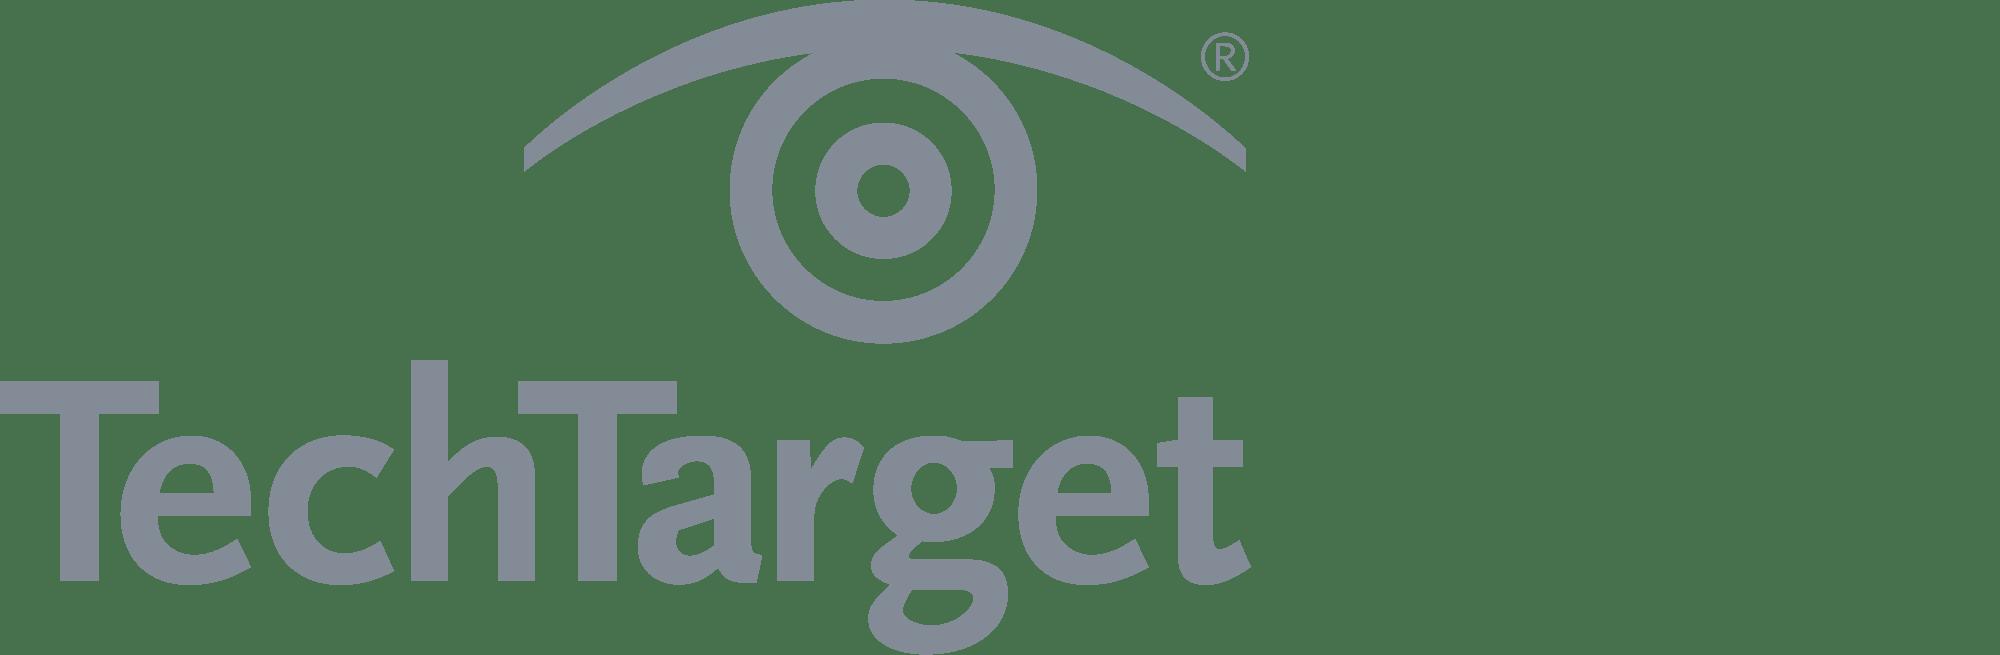 Tech-Target-Logo